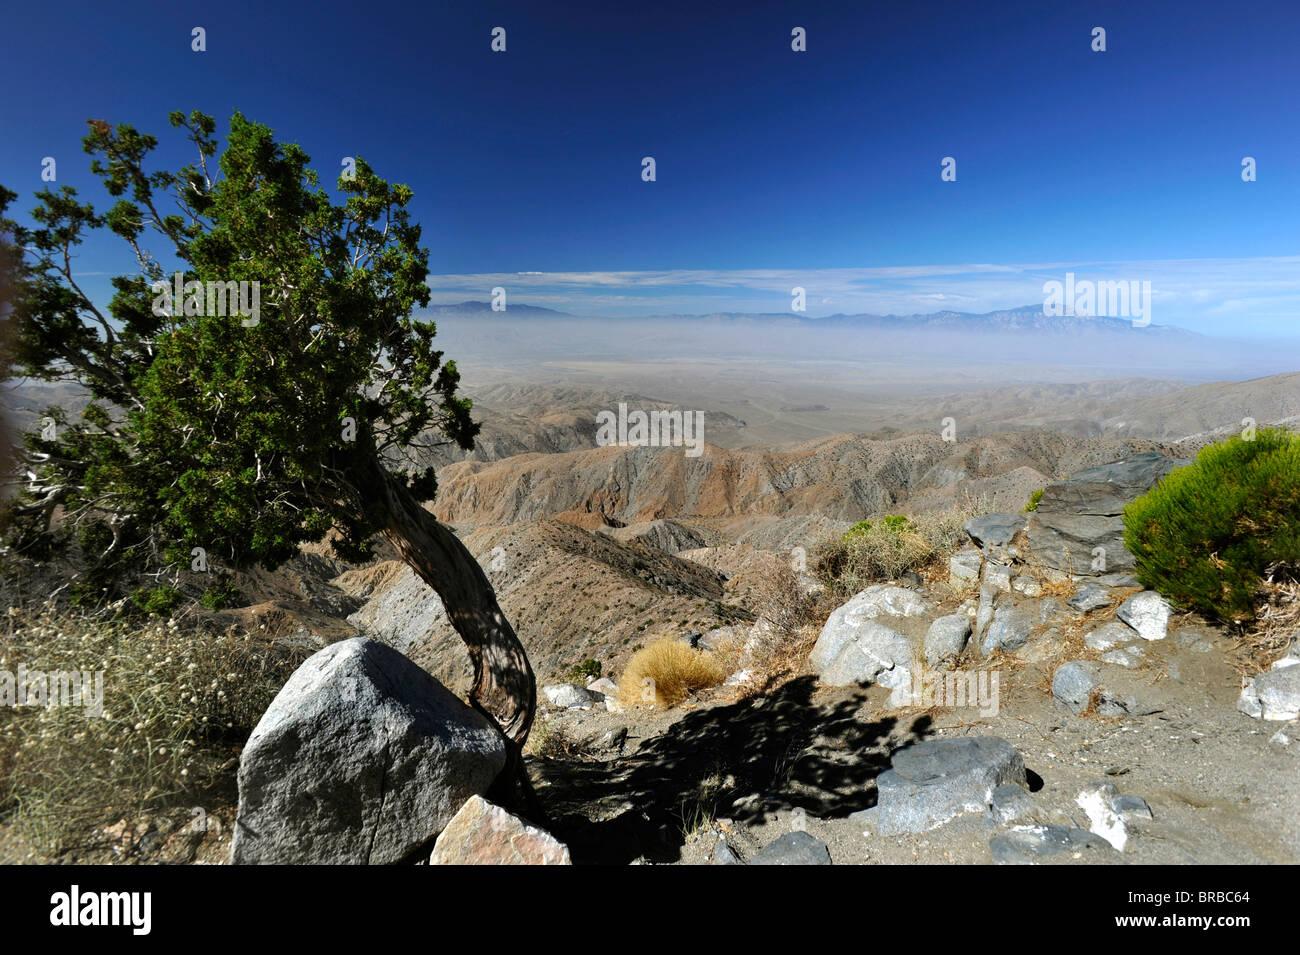 Joshua Tree National Park Arizona air pollution - Stock Image